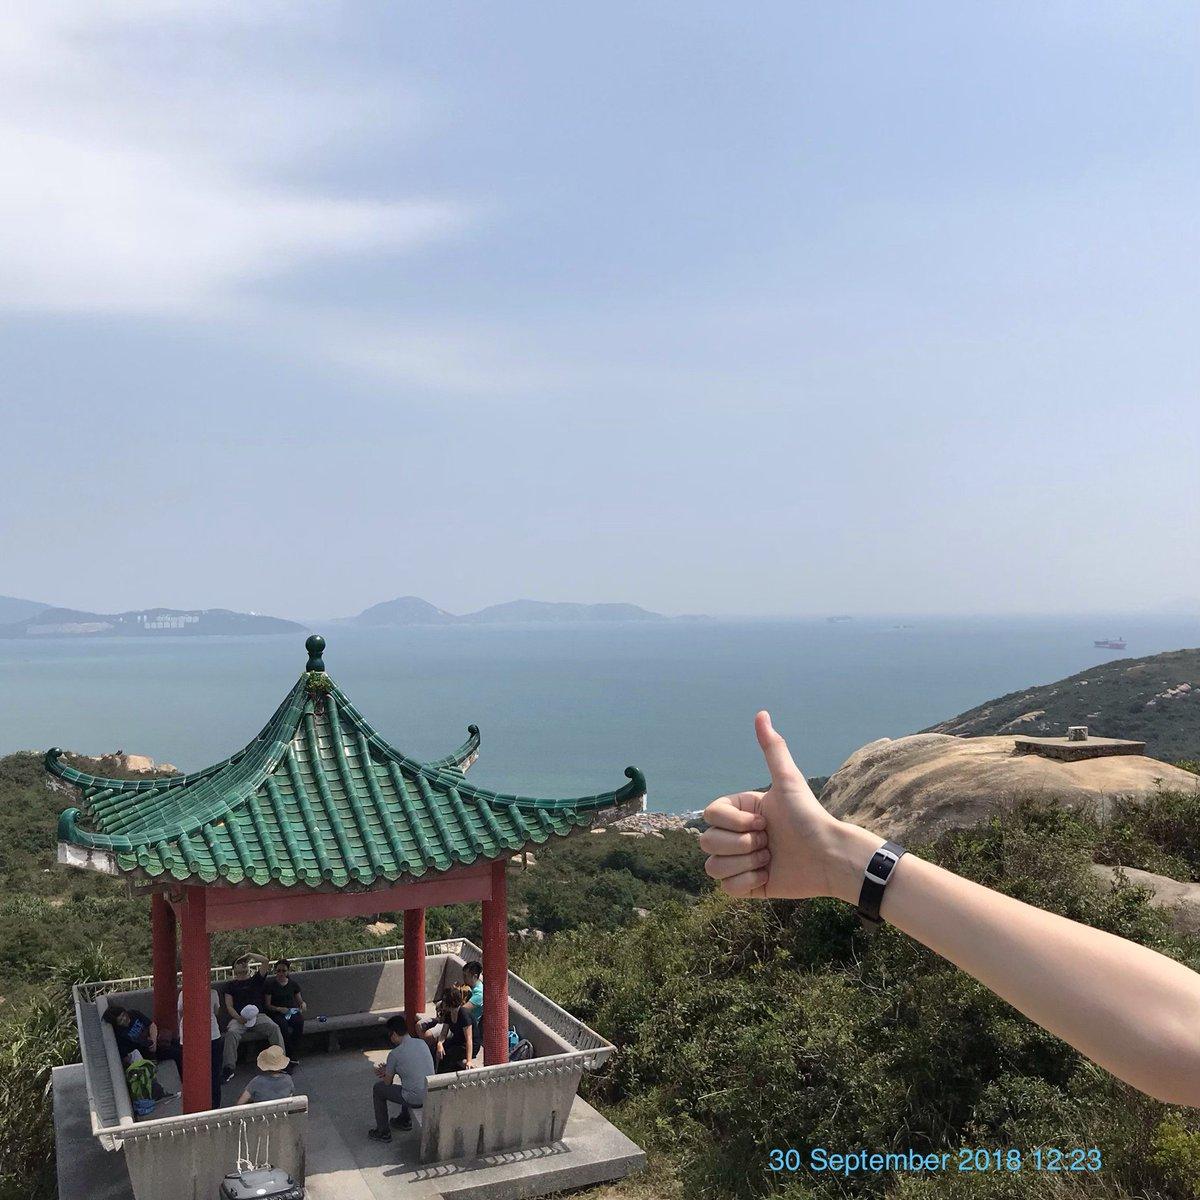 Climb from Tung O village to view South China sea from Lamma island